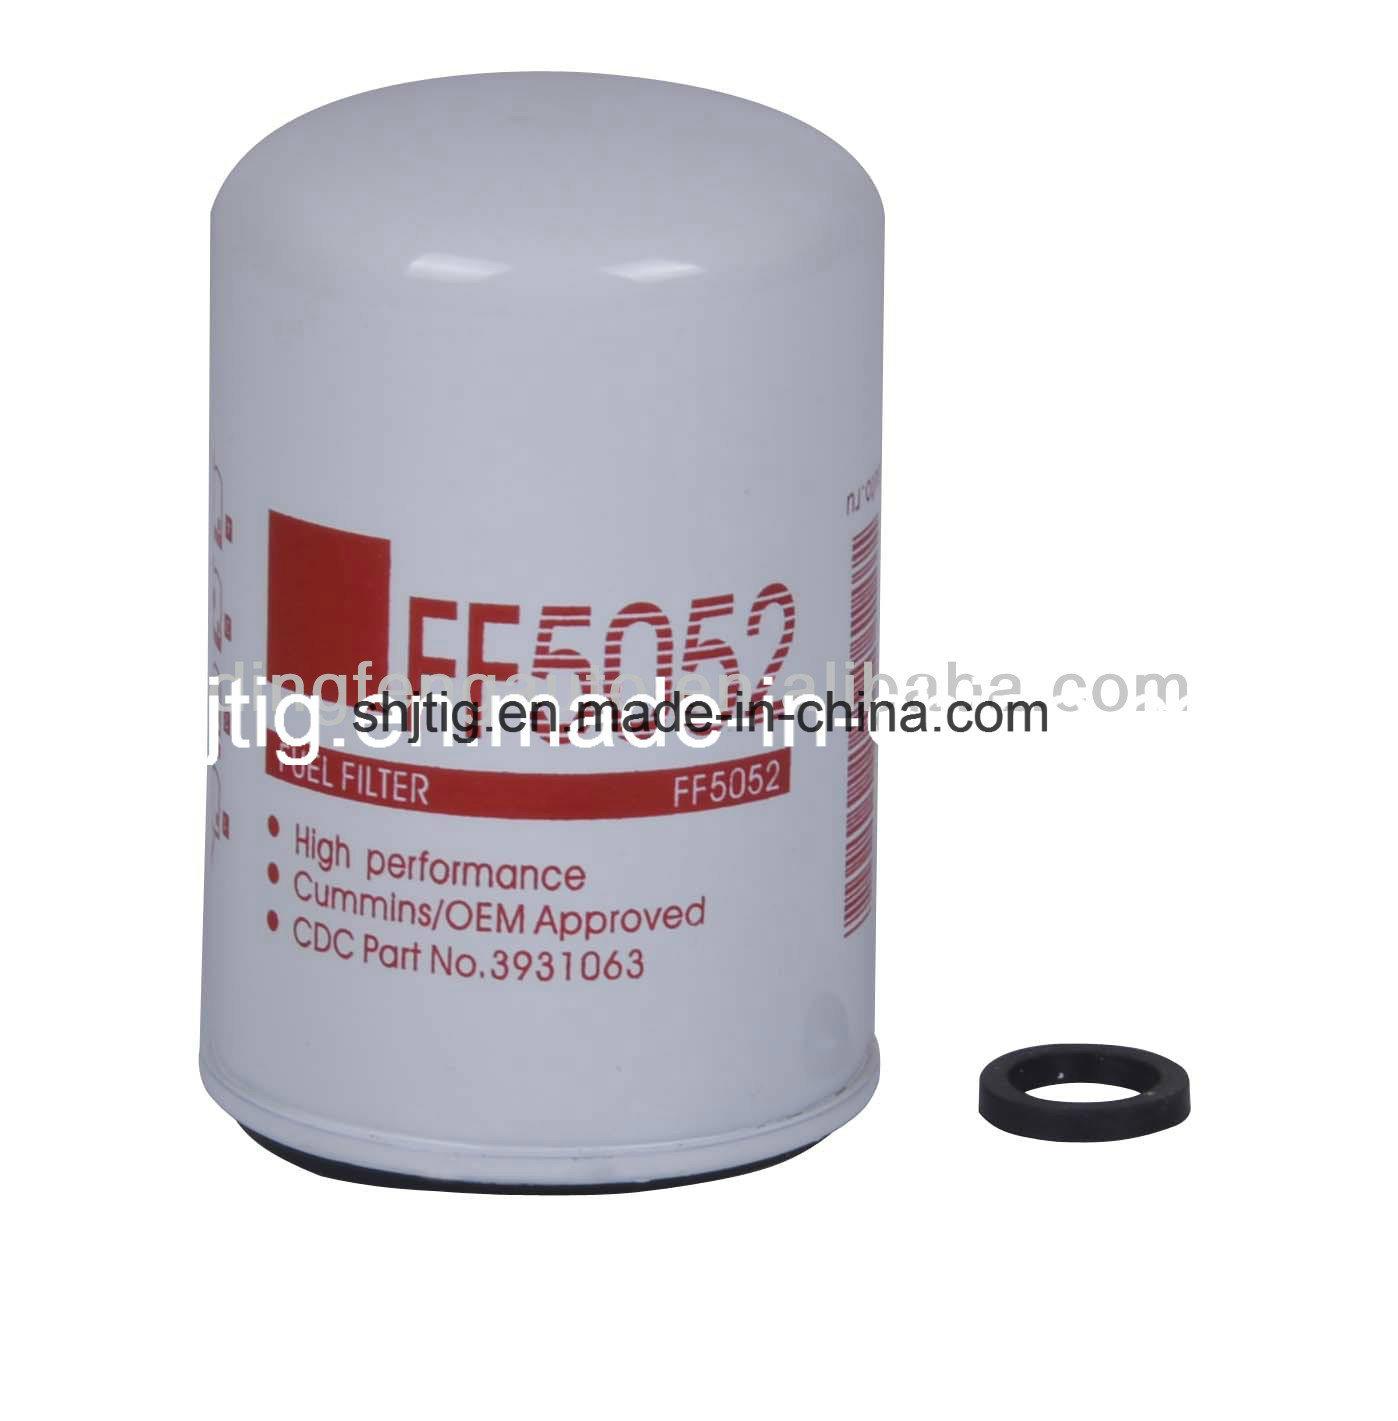 China Fleetguard Fuel Filter FF5052 for Cummins Engine - China Fuel Filter,  Oil Filter